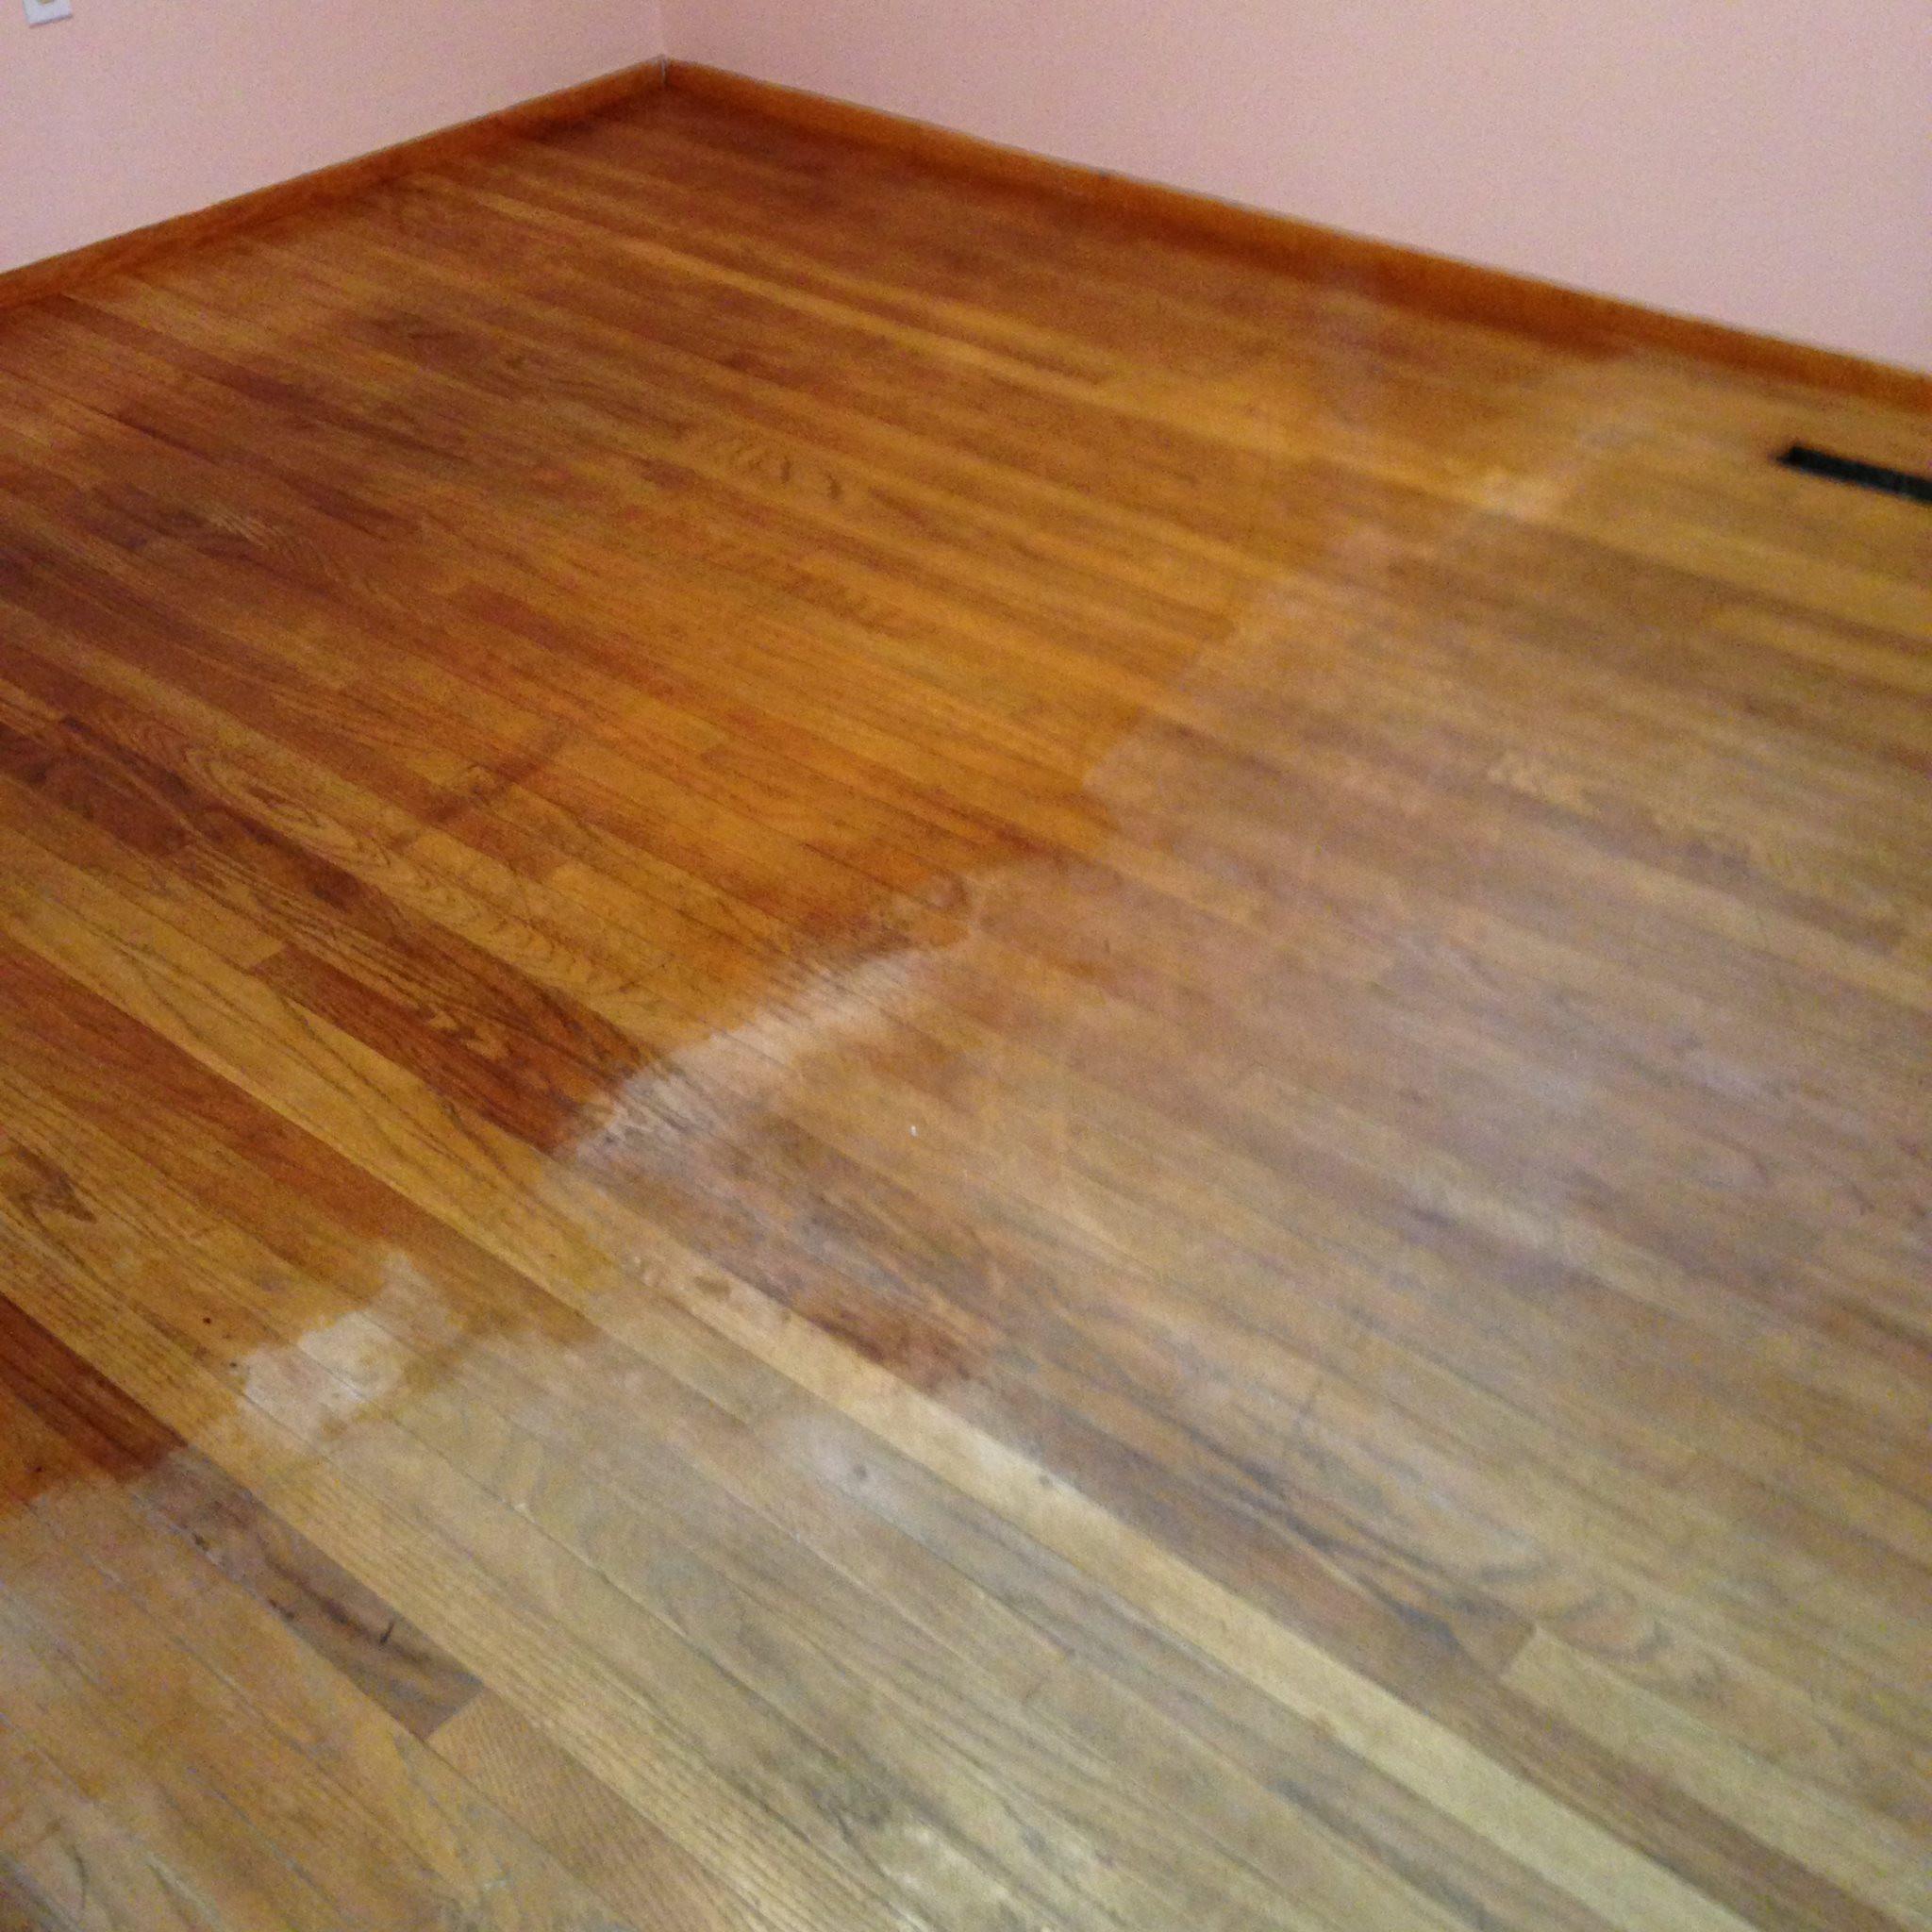 furniture leg protectors for hardwood floors of 15 wood floor hacks every homeowner needs to know within wood floor hacks 15